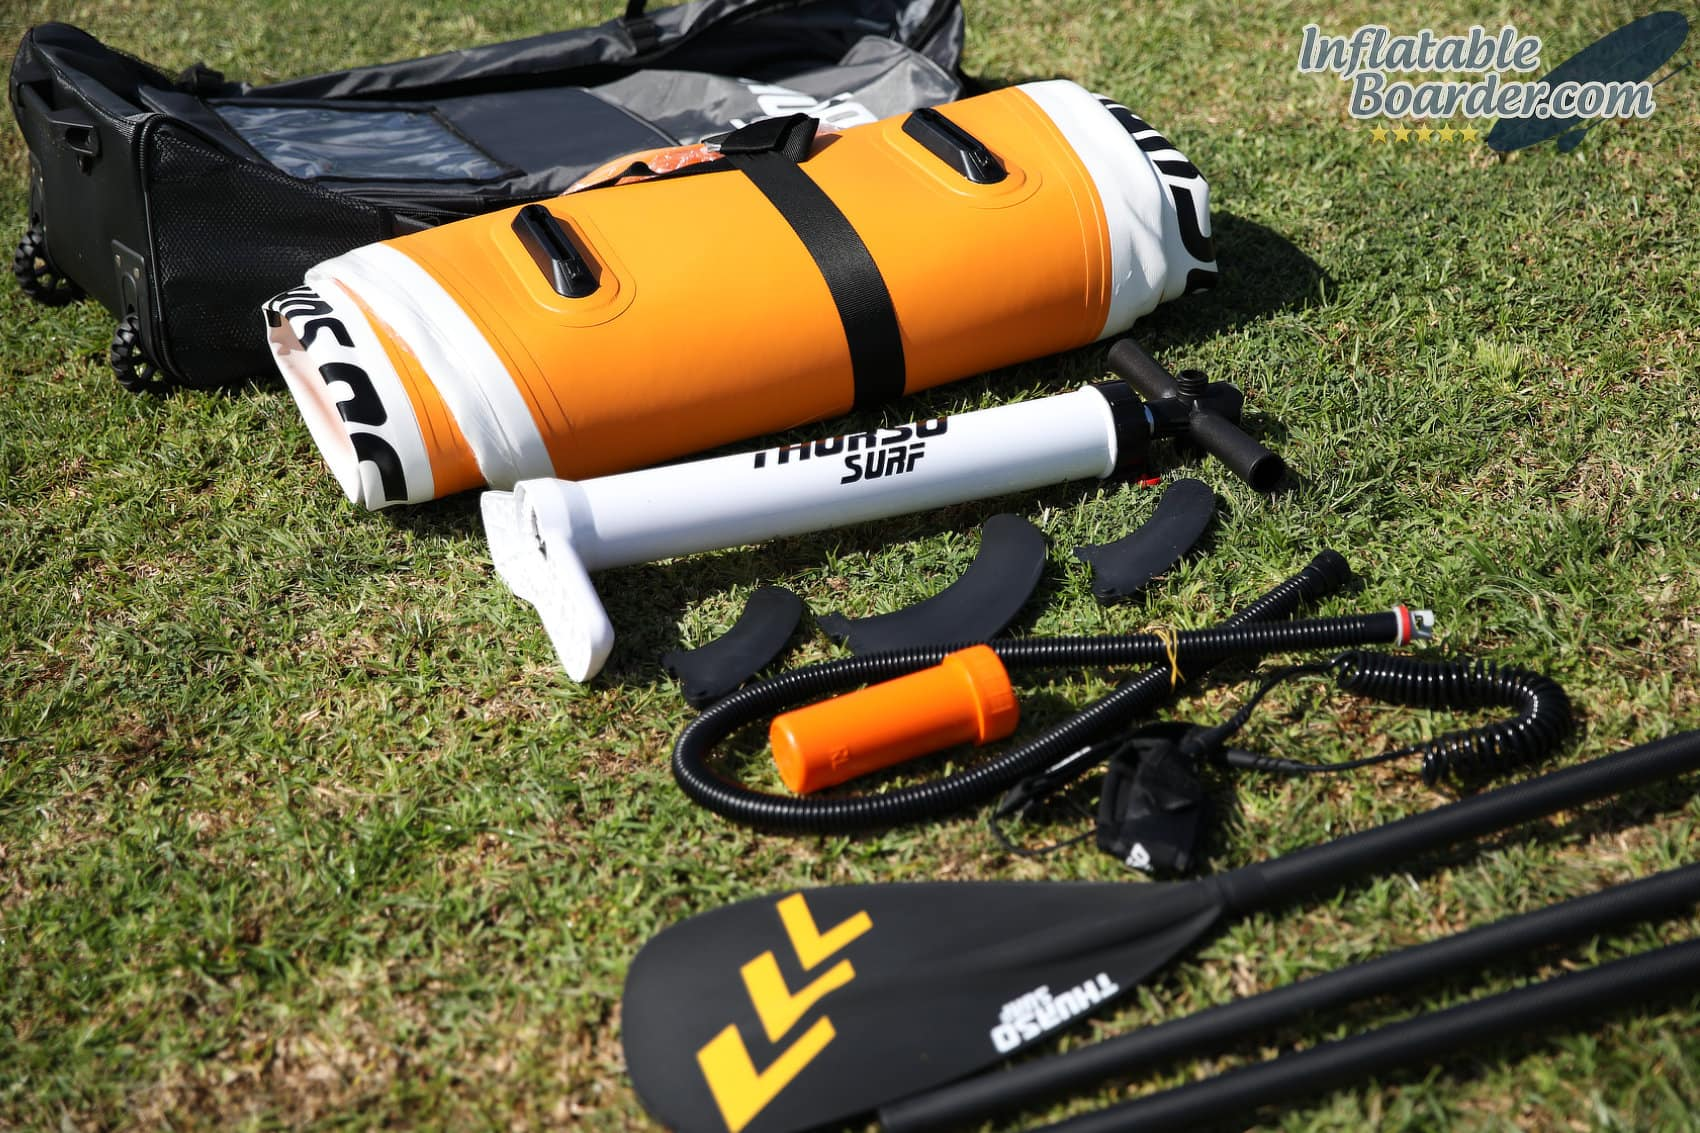 THURSO SURF SUP Accessories